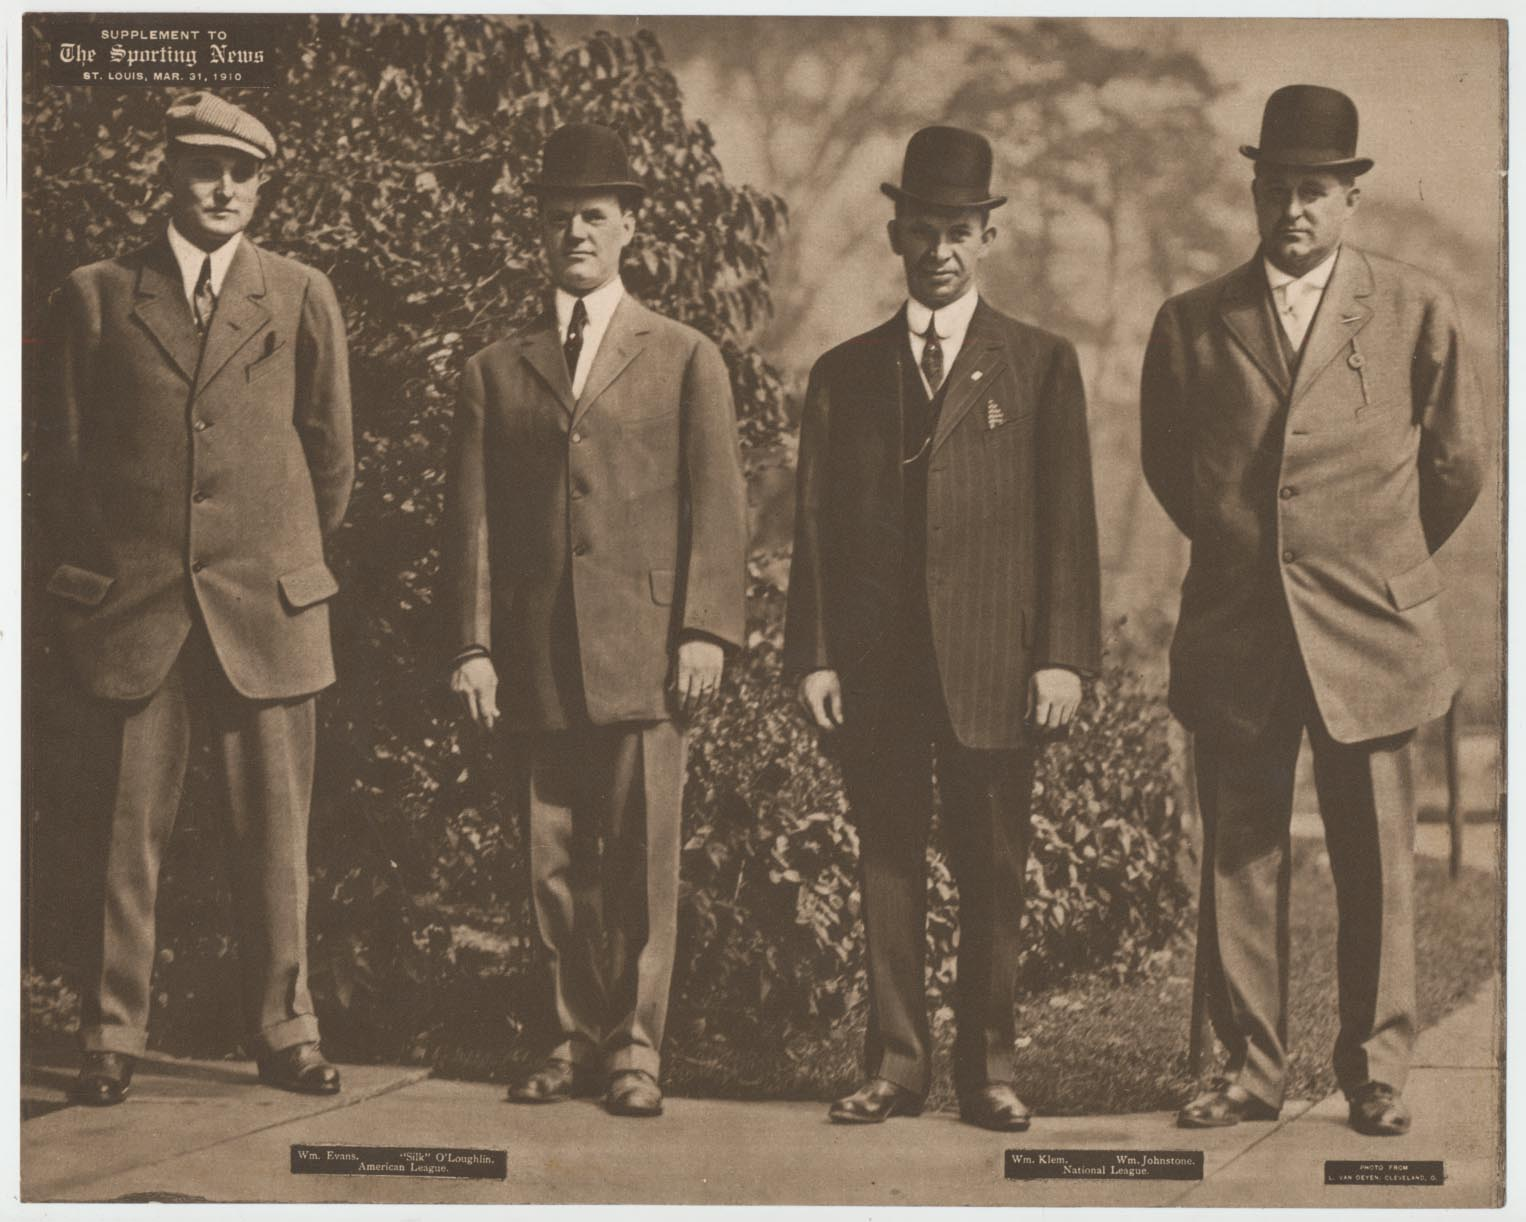 1911 M101-2 37 Wm. Evans, Silk OLoughlin, William Klem, Wm. Johnston (3/31) VG-Ex/Ex